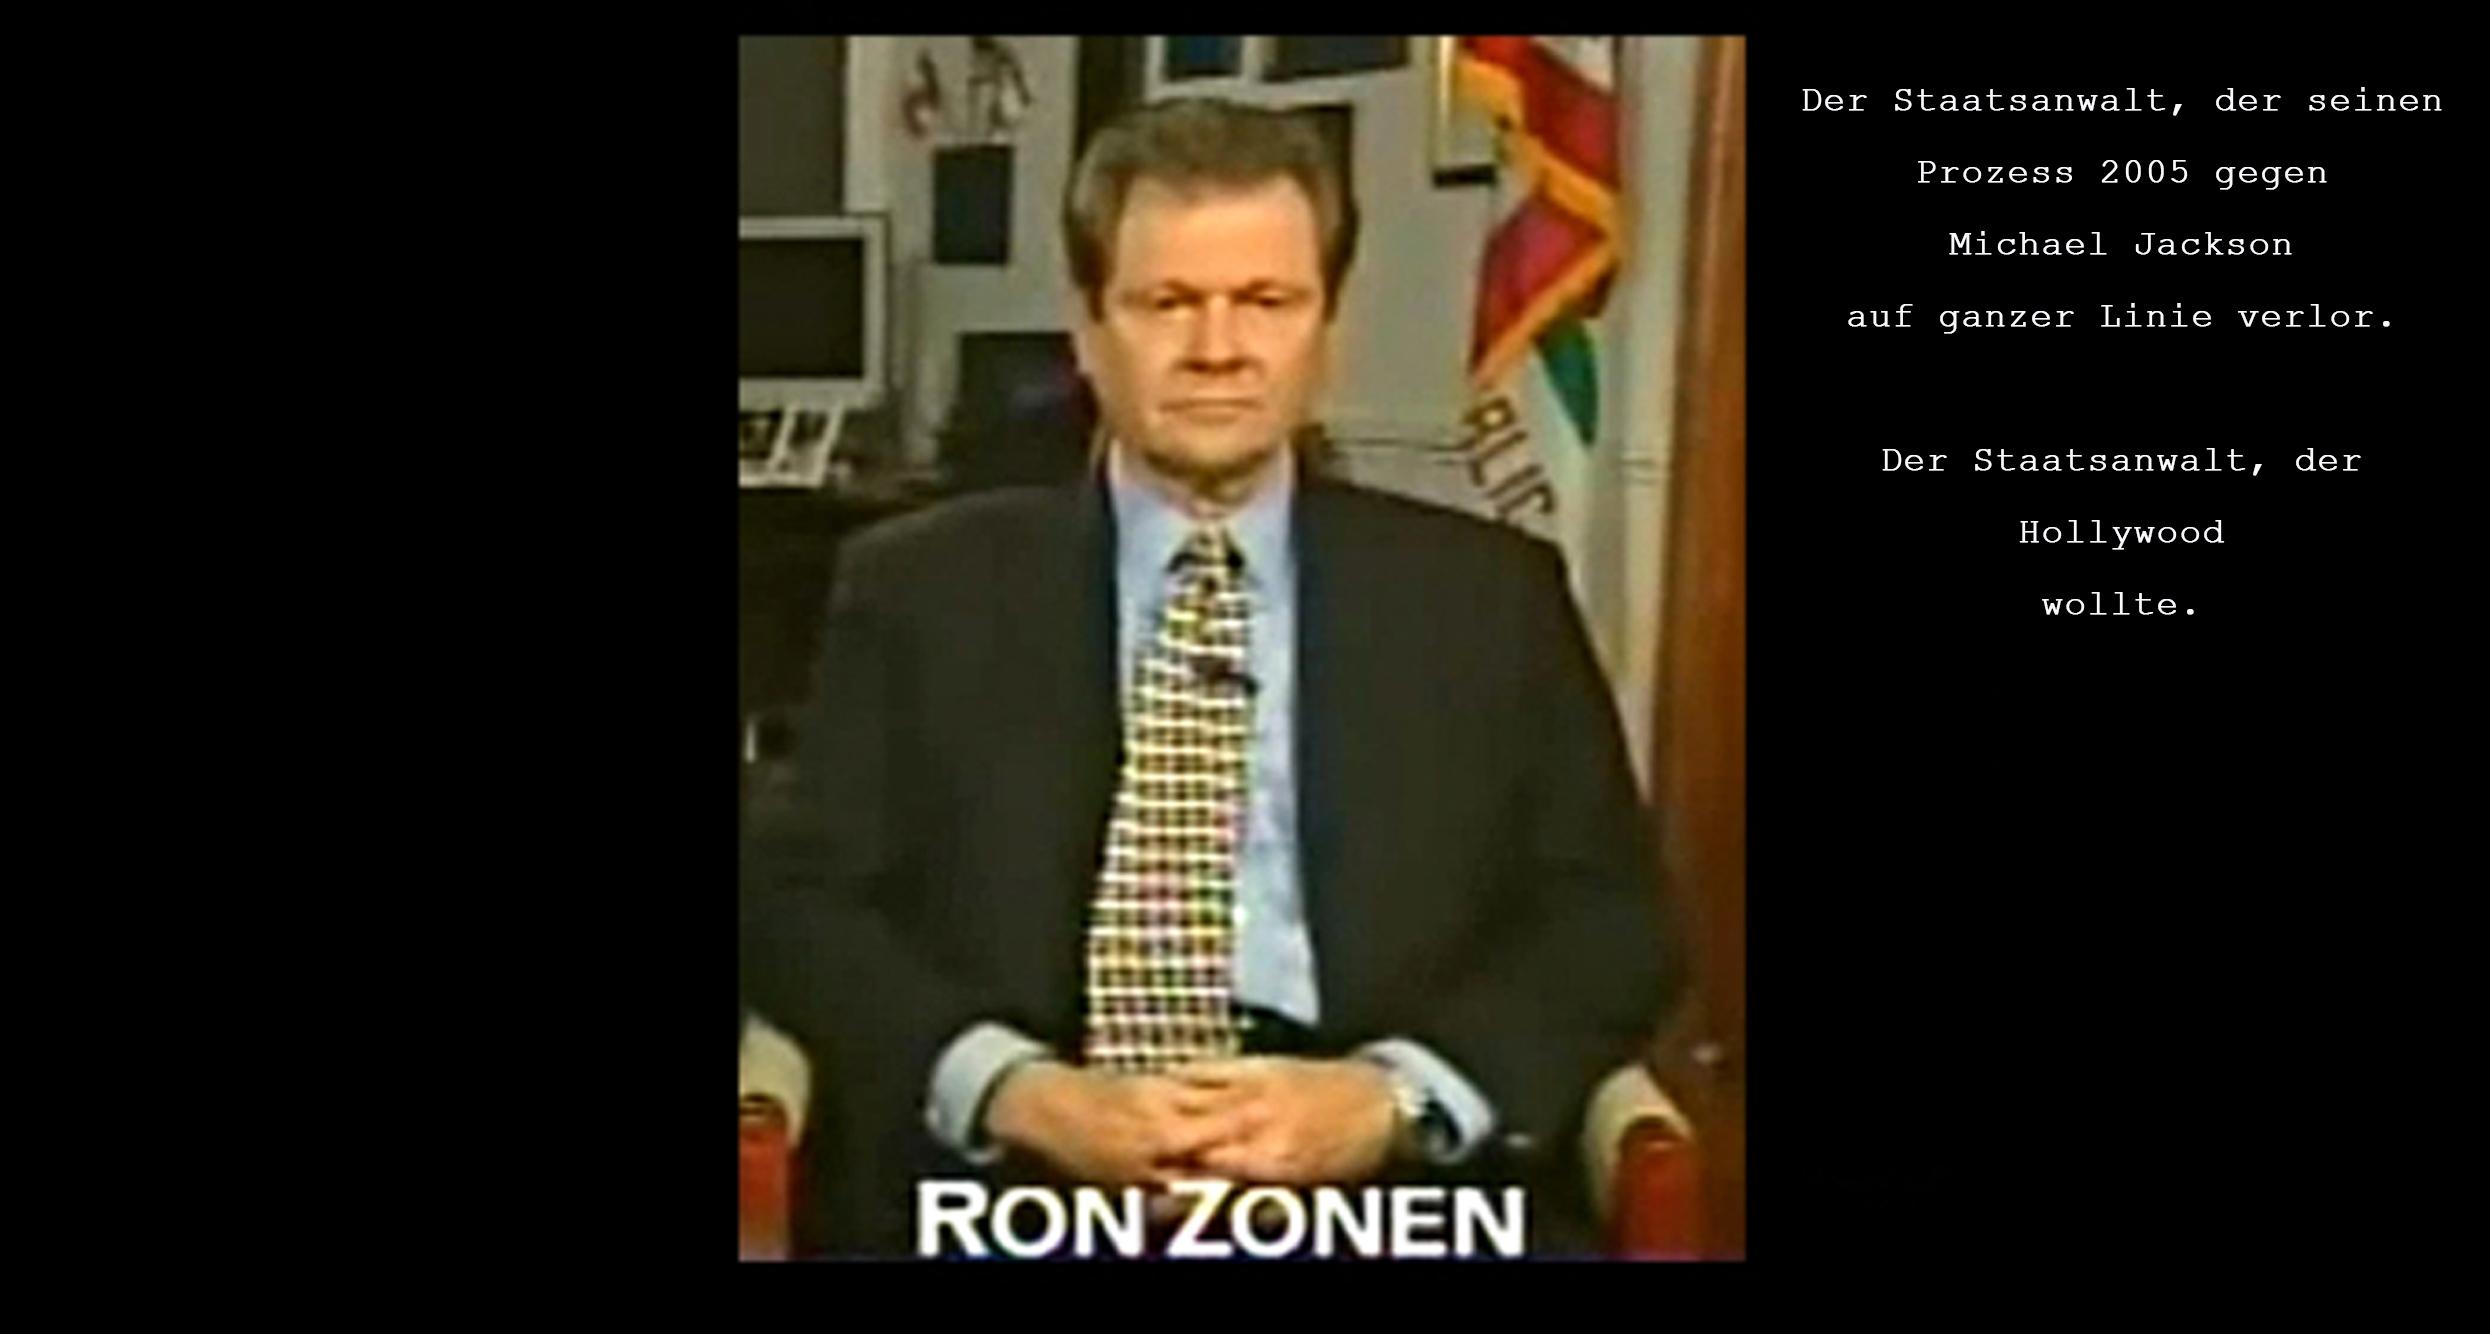 Staatsanwalt Ron Zonen verliert seinen Prozess gegen Michael Jackson 2005